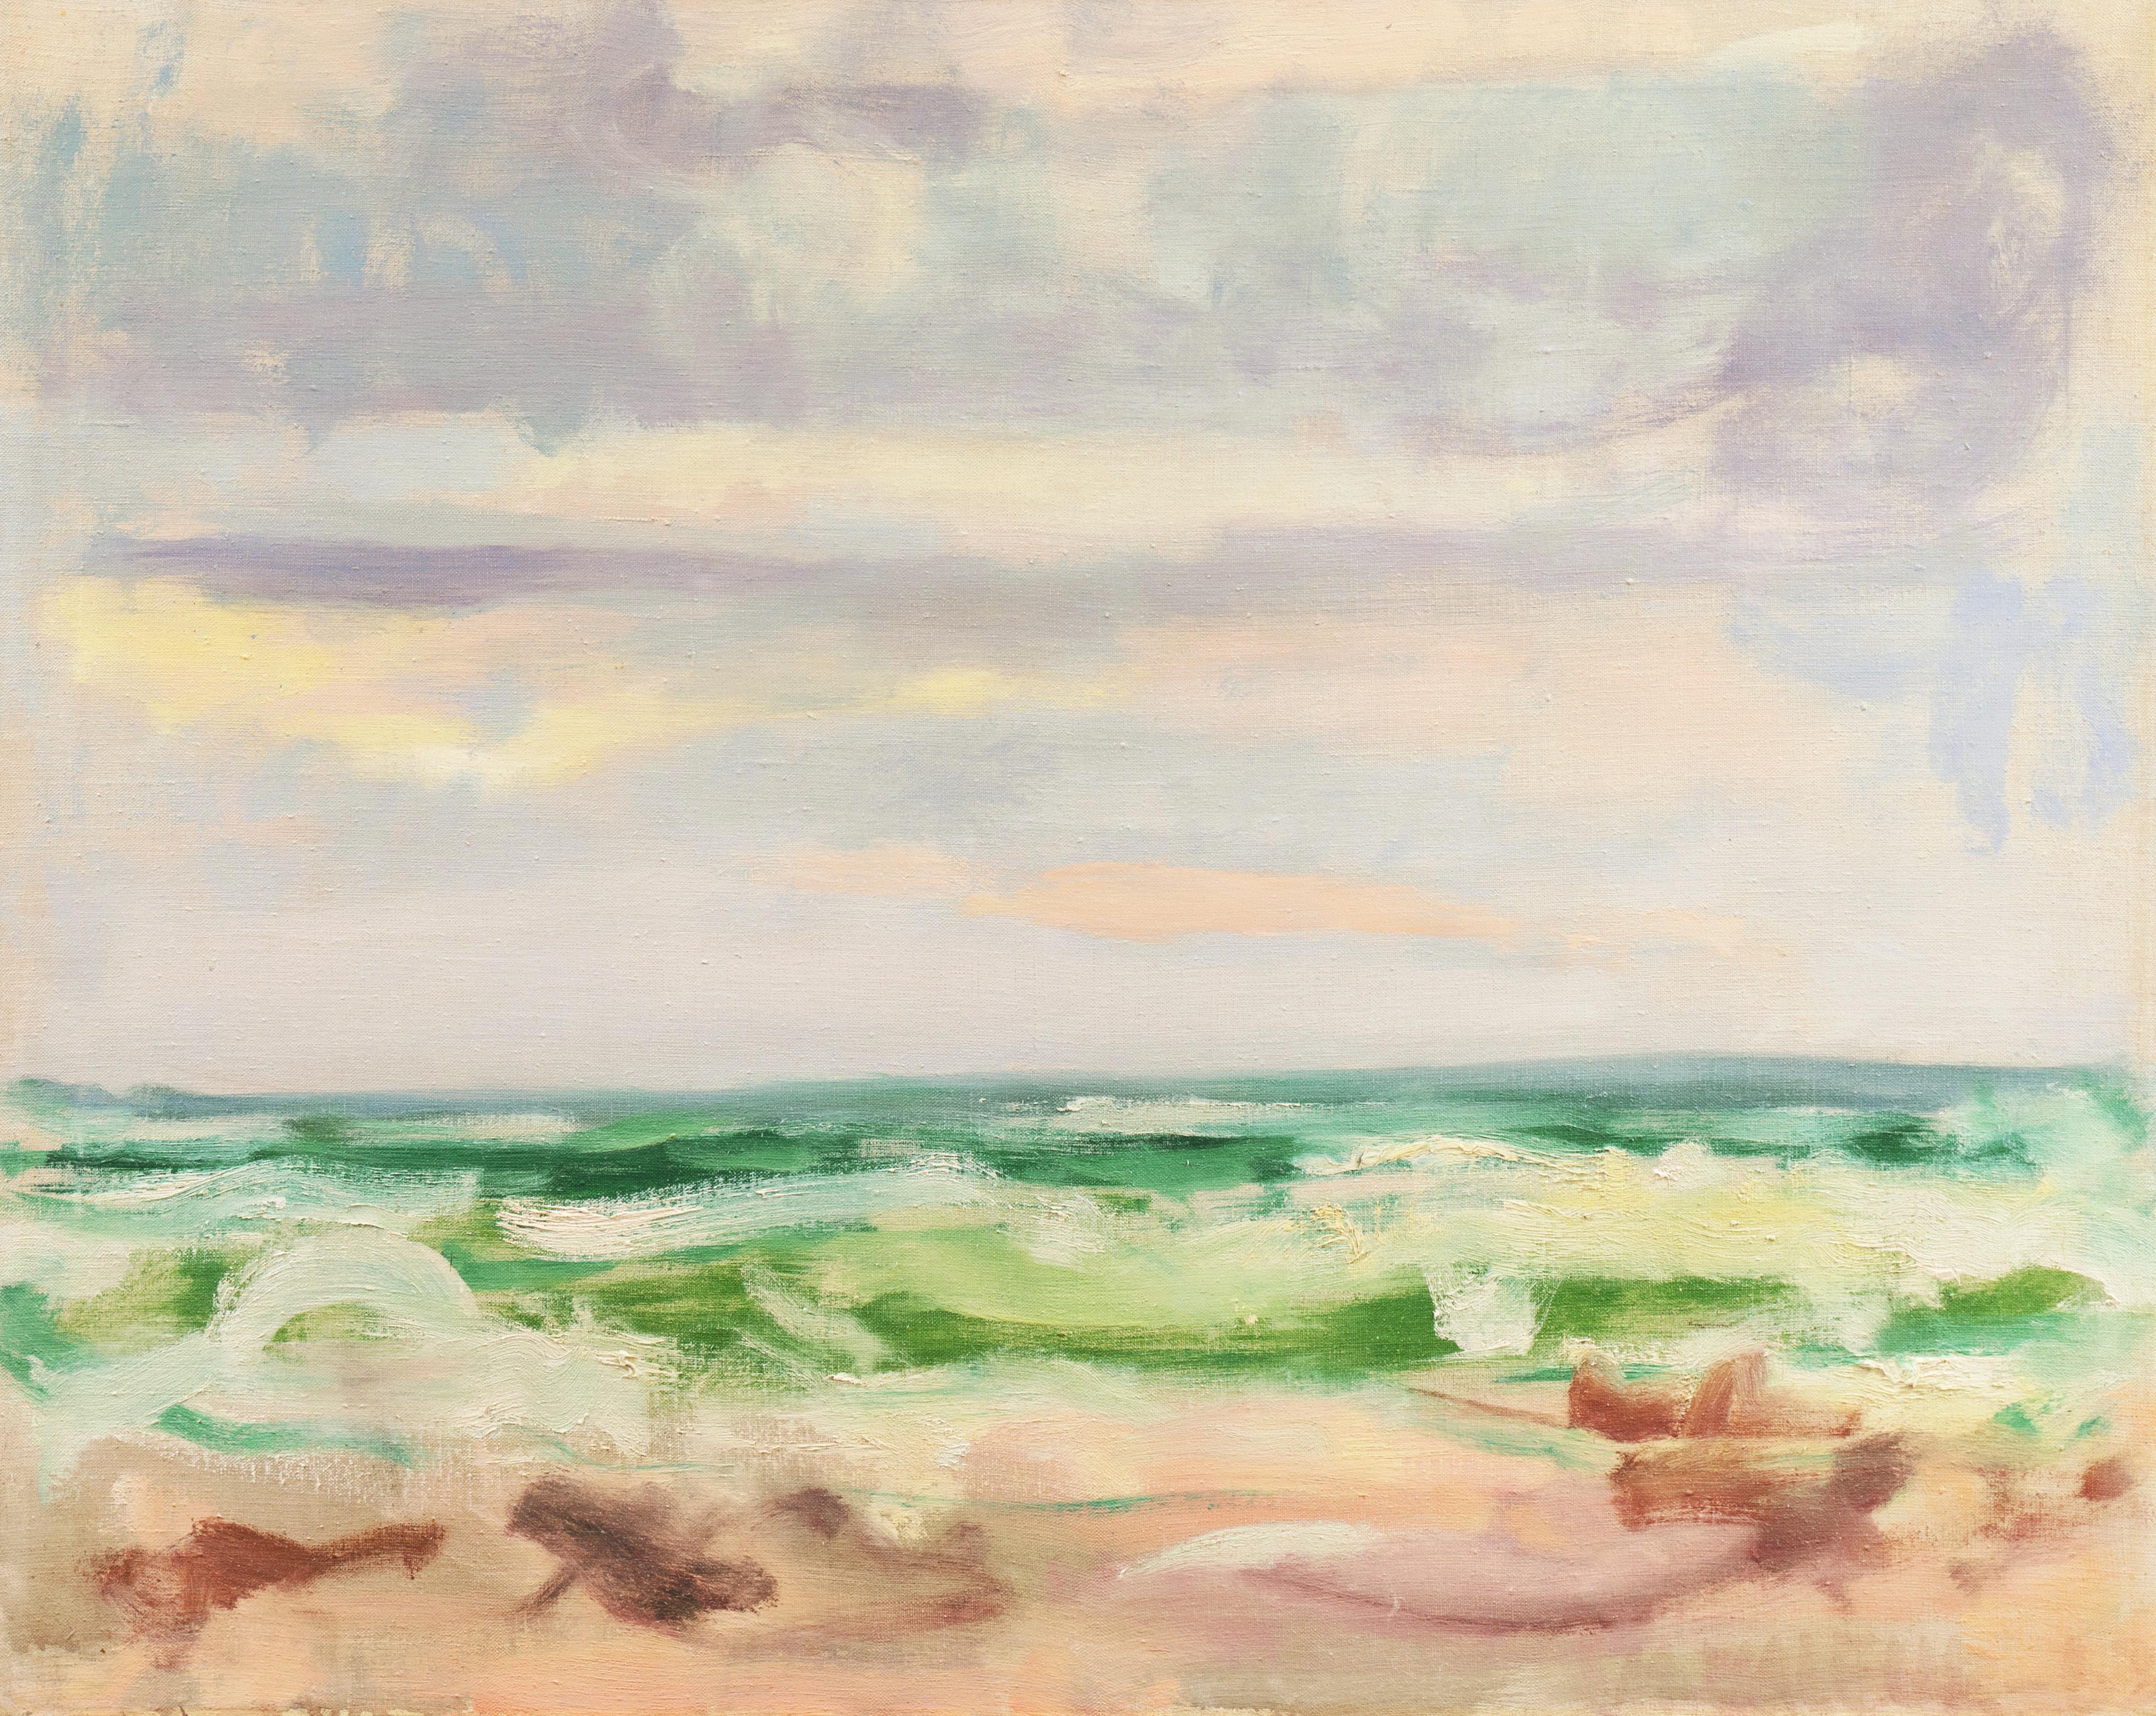 'Ocean Breakers at Sunset', Copenhagen Royal Academy, Charlottenborg Institute